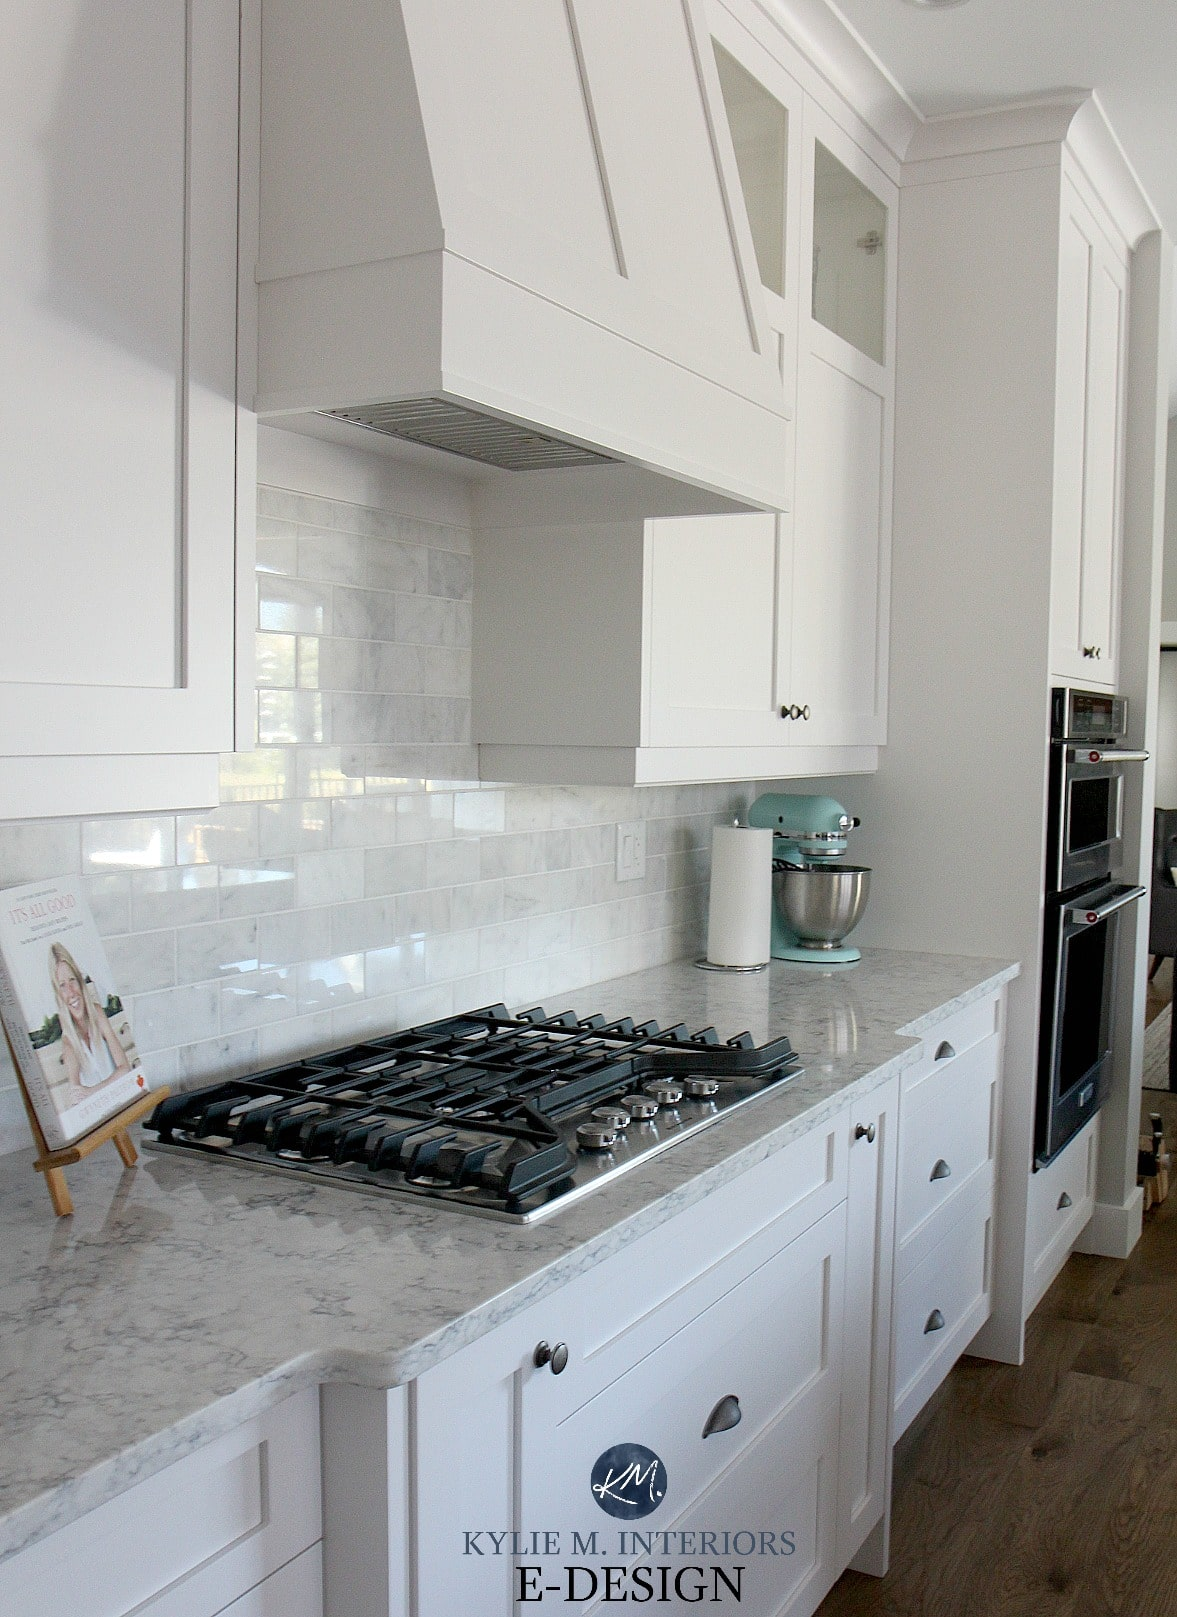 Lg White Quartz Kitchen Countertop High Reflective White Cabinets Subway Marble Tile Backsplash Kylie M Interiors Edesign Online Paint Color Blogger And Consultant